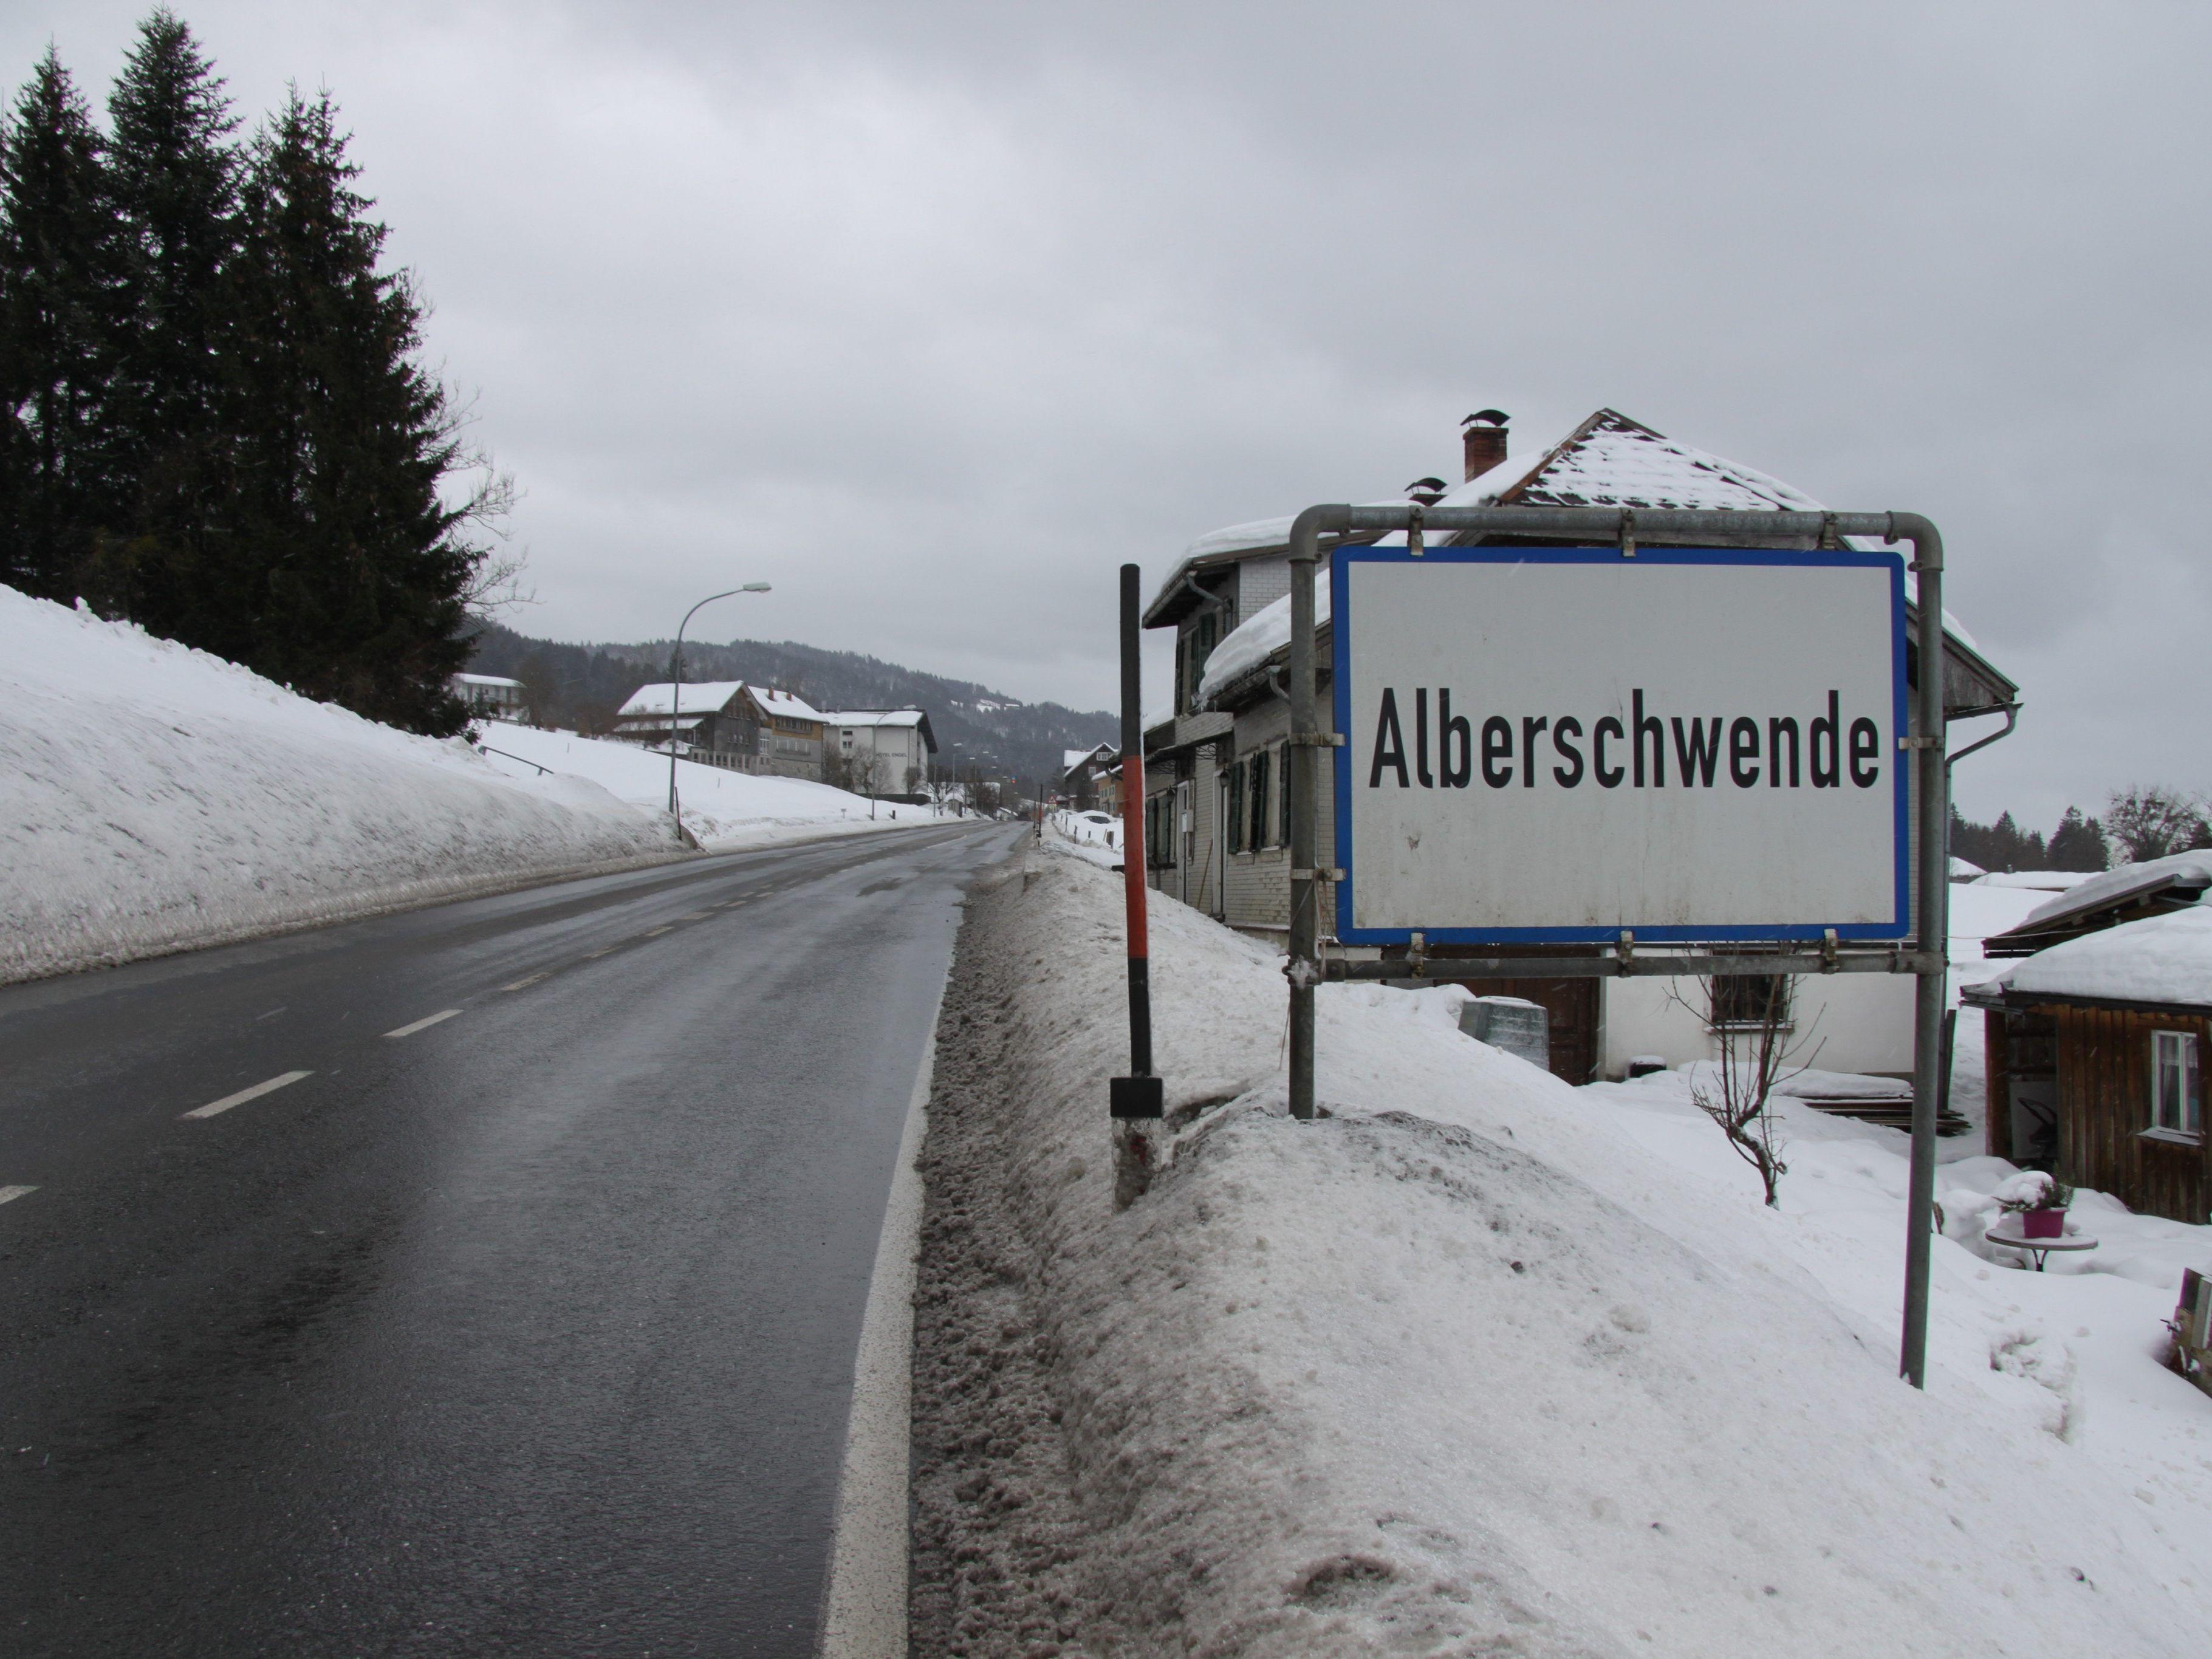 Unfall in Alberschwende - Motorrad gegen Pkw - comunidadelectronica.com